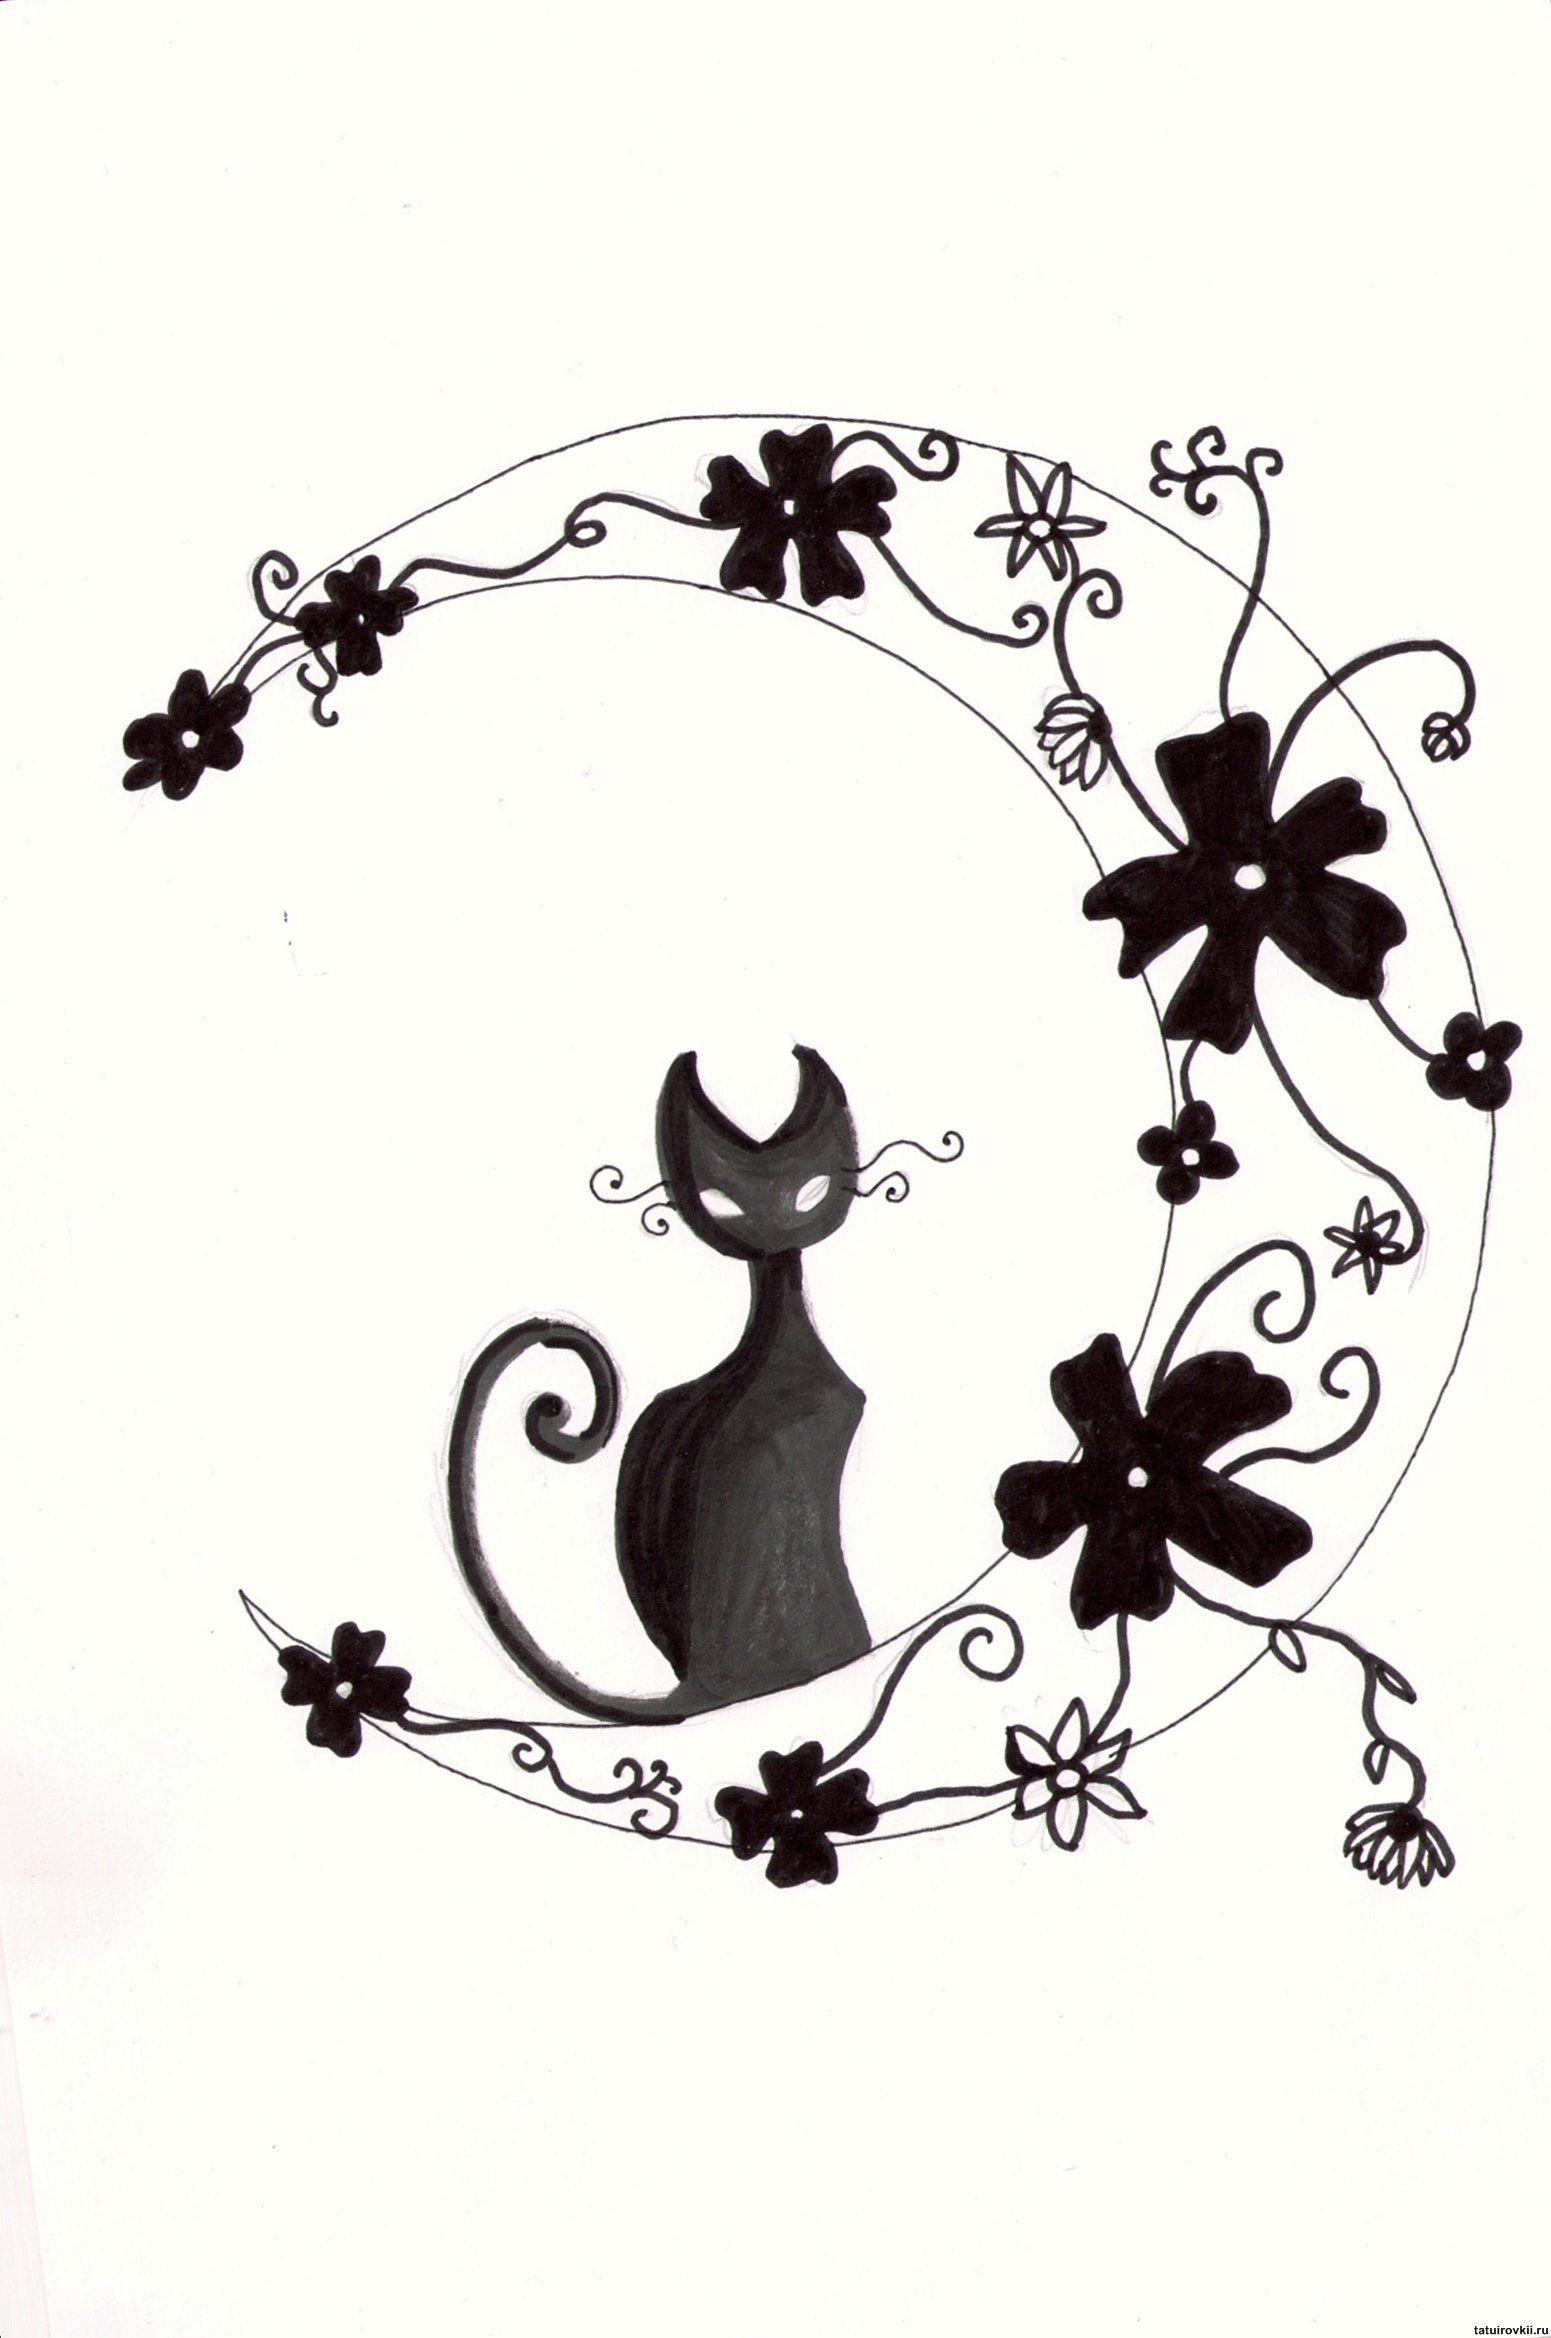 Tribal Cat Tattoo Designs pin cute cat tattoos moon eyes